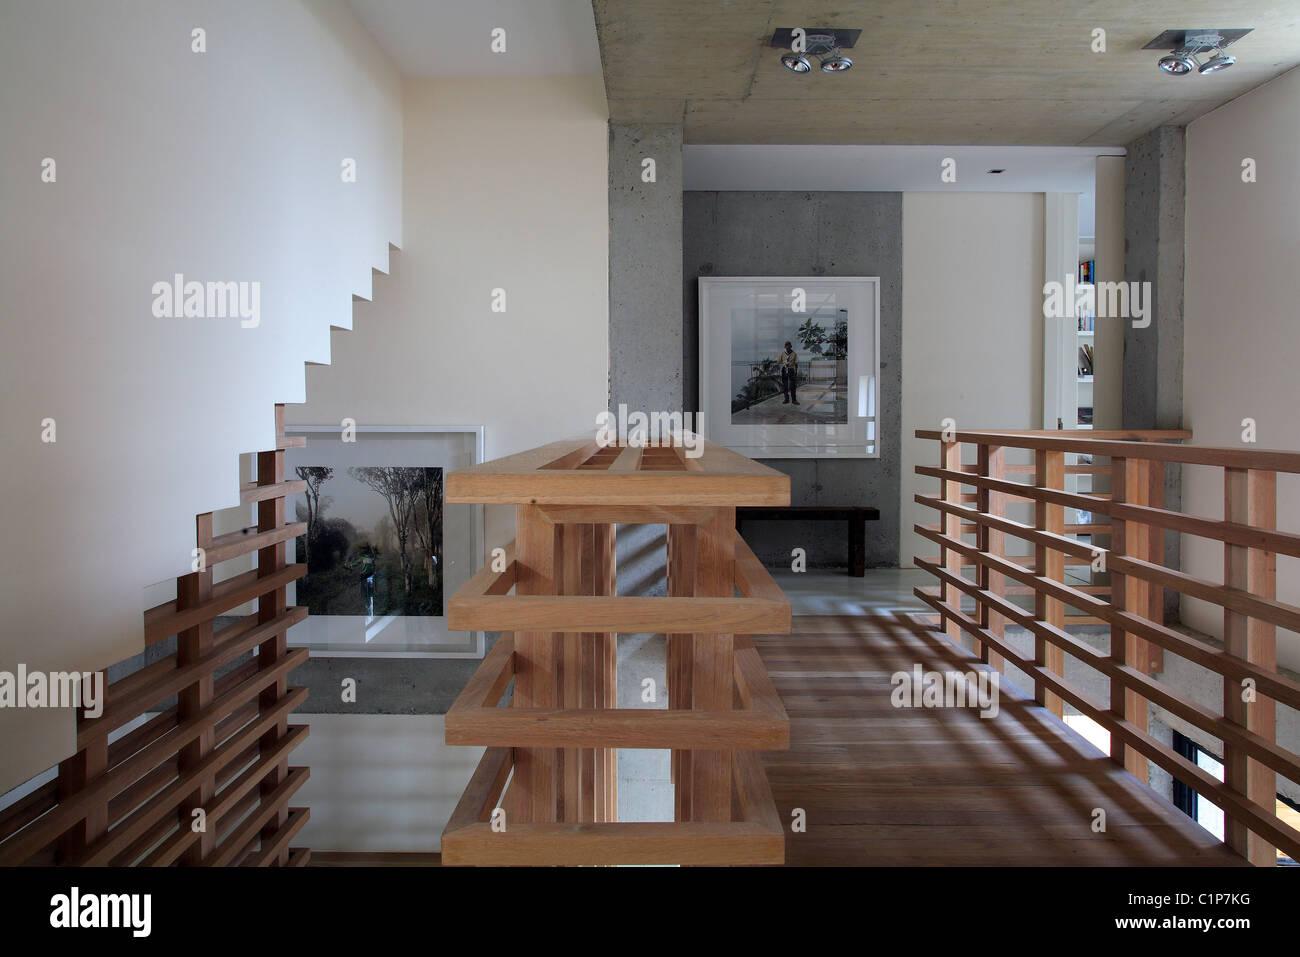 Sudáfrica, Cape Town, Camps Bay, interieur de arquitectos casa Foto de stock